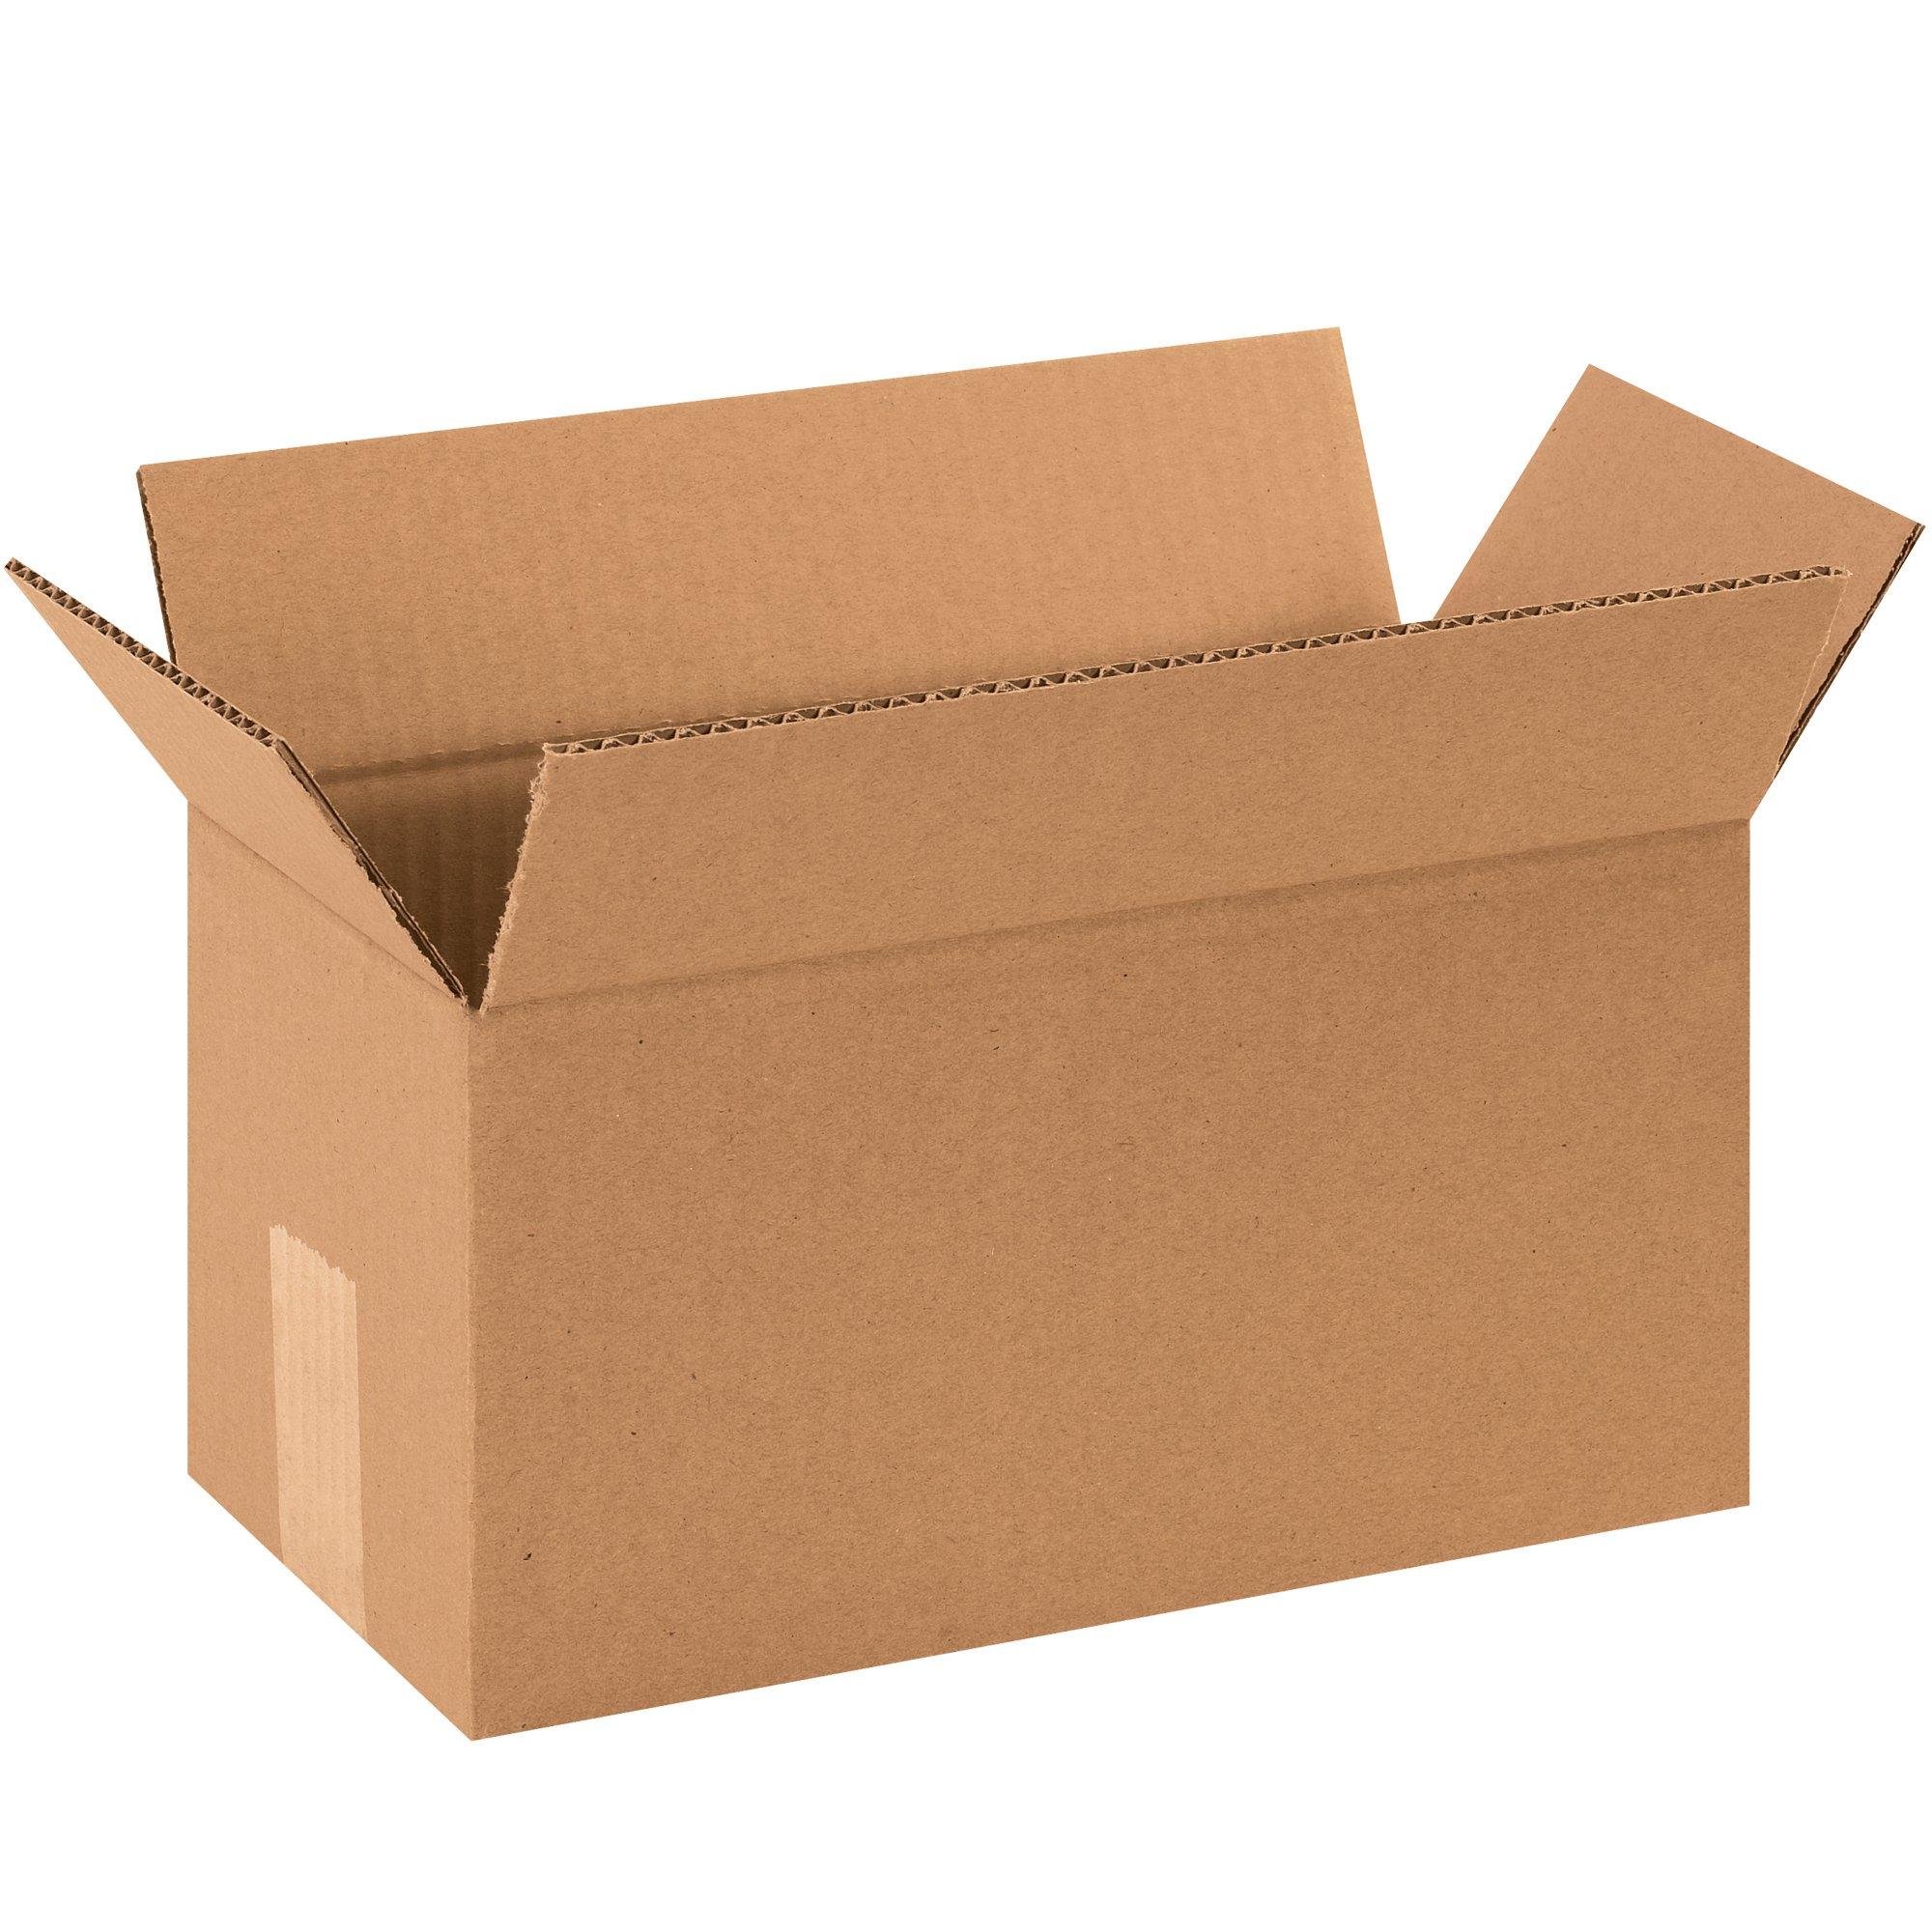 BOX USA B12662000PK Long Corrugated Boxes, 12''L x 6''W x 6''H, Kraft (Pack of 2000)